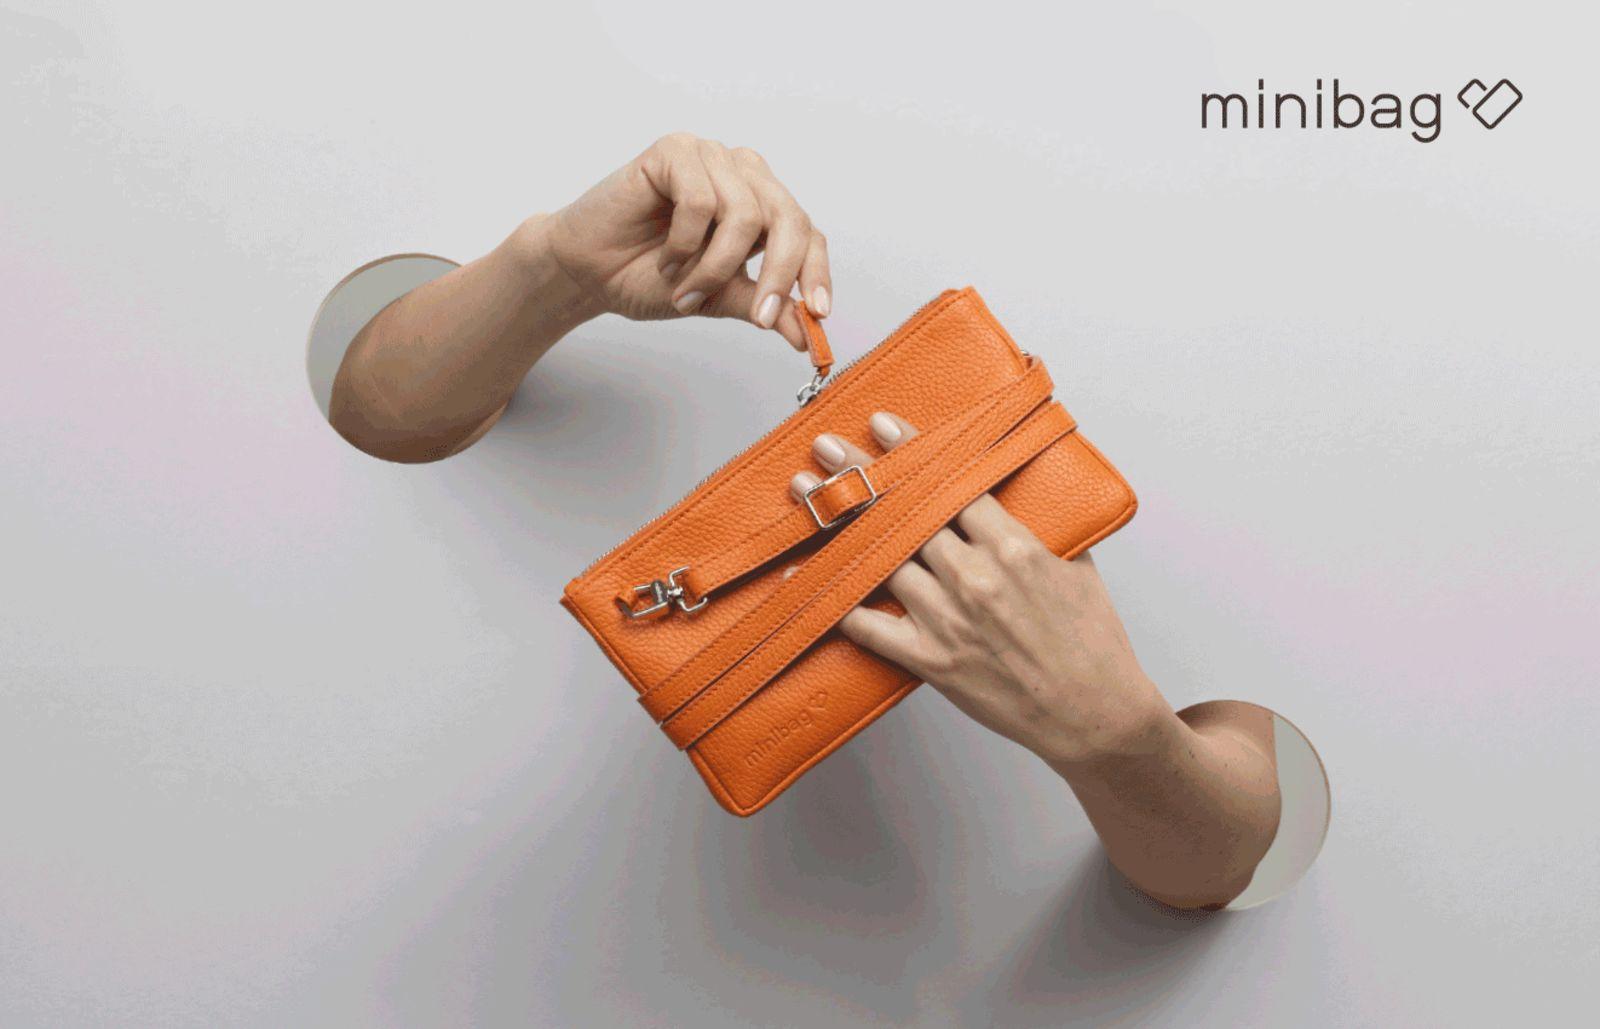 minibag (Bild 2)